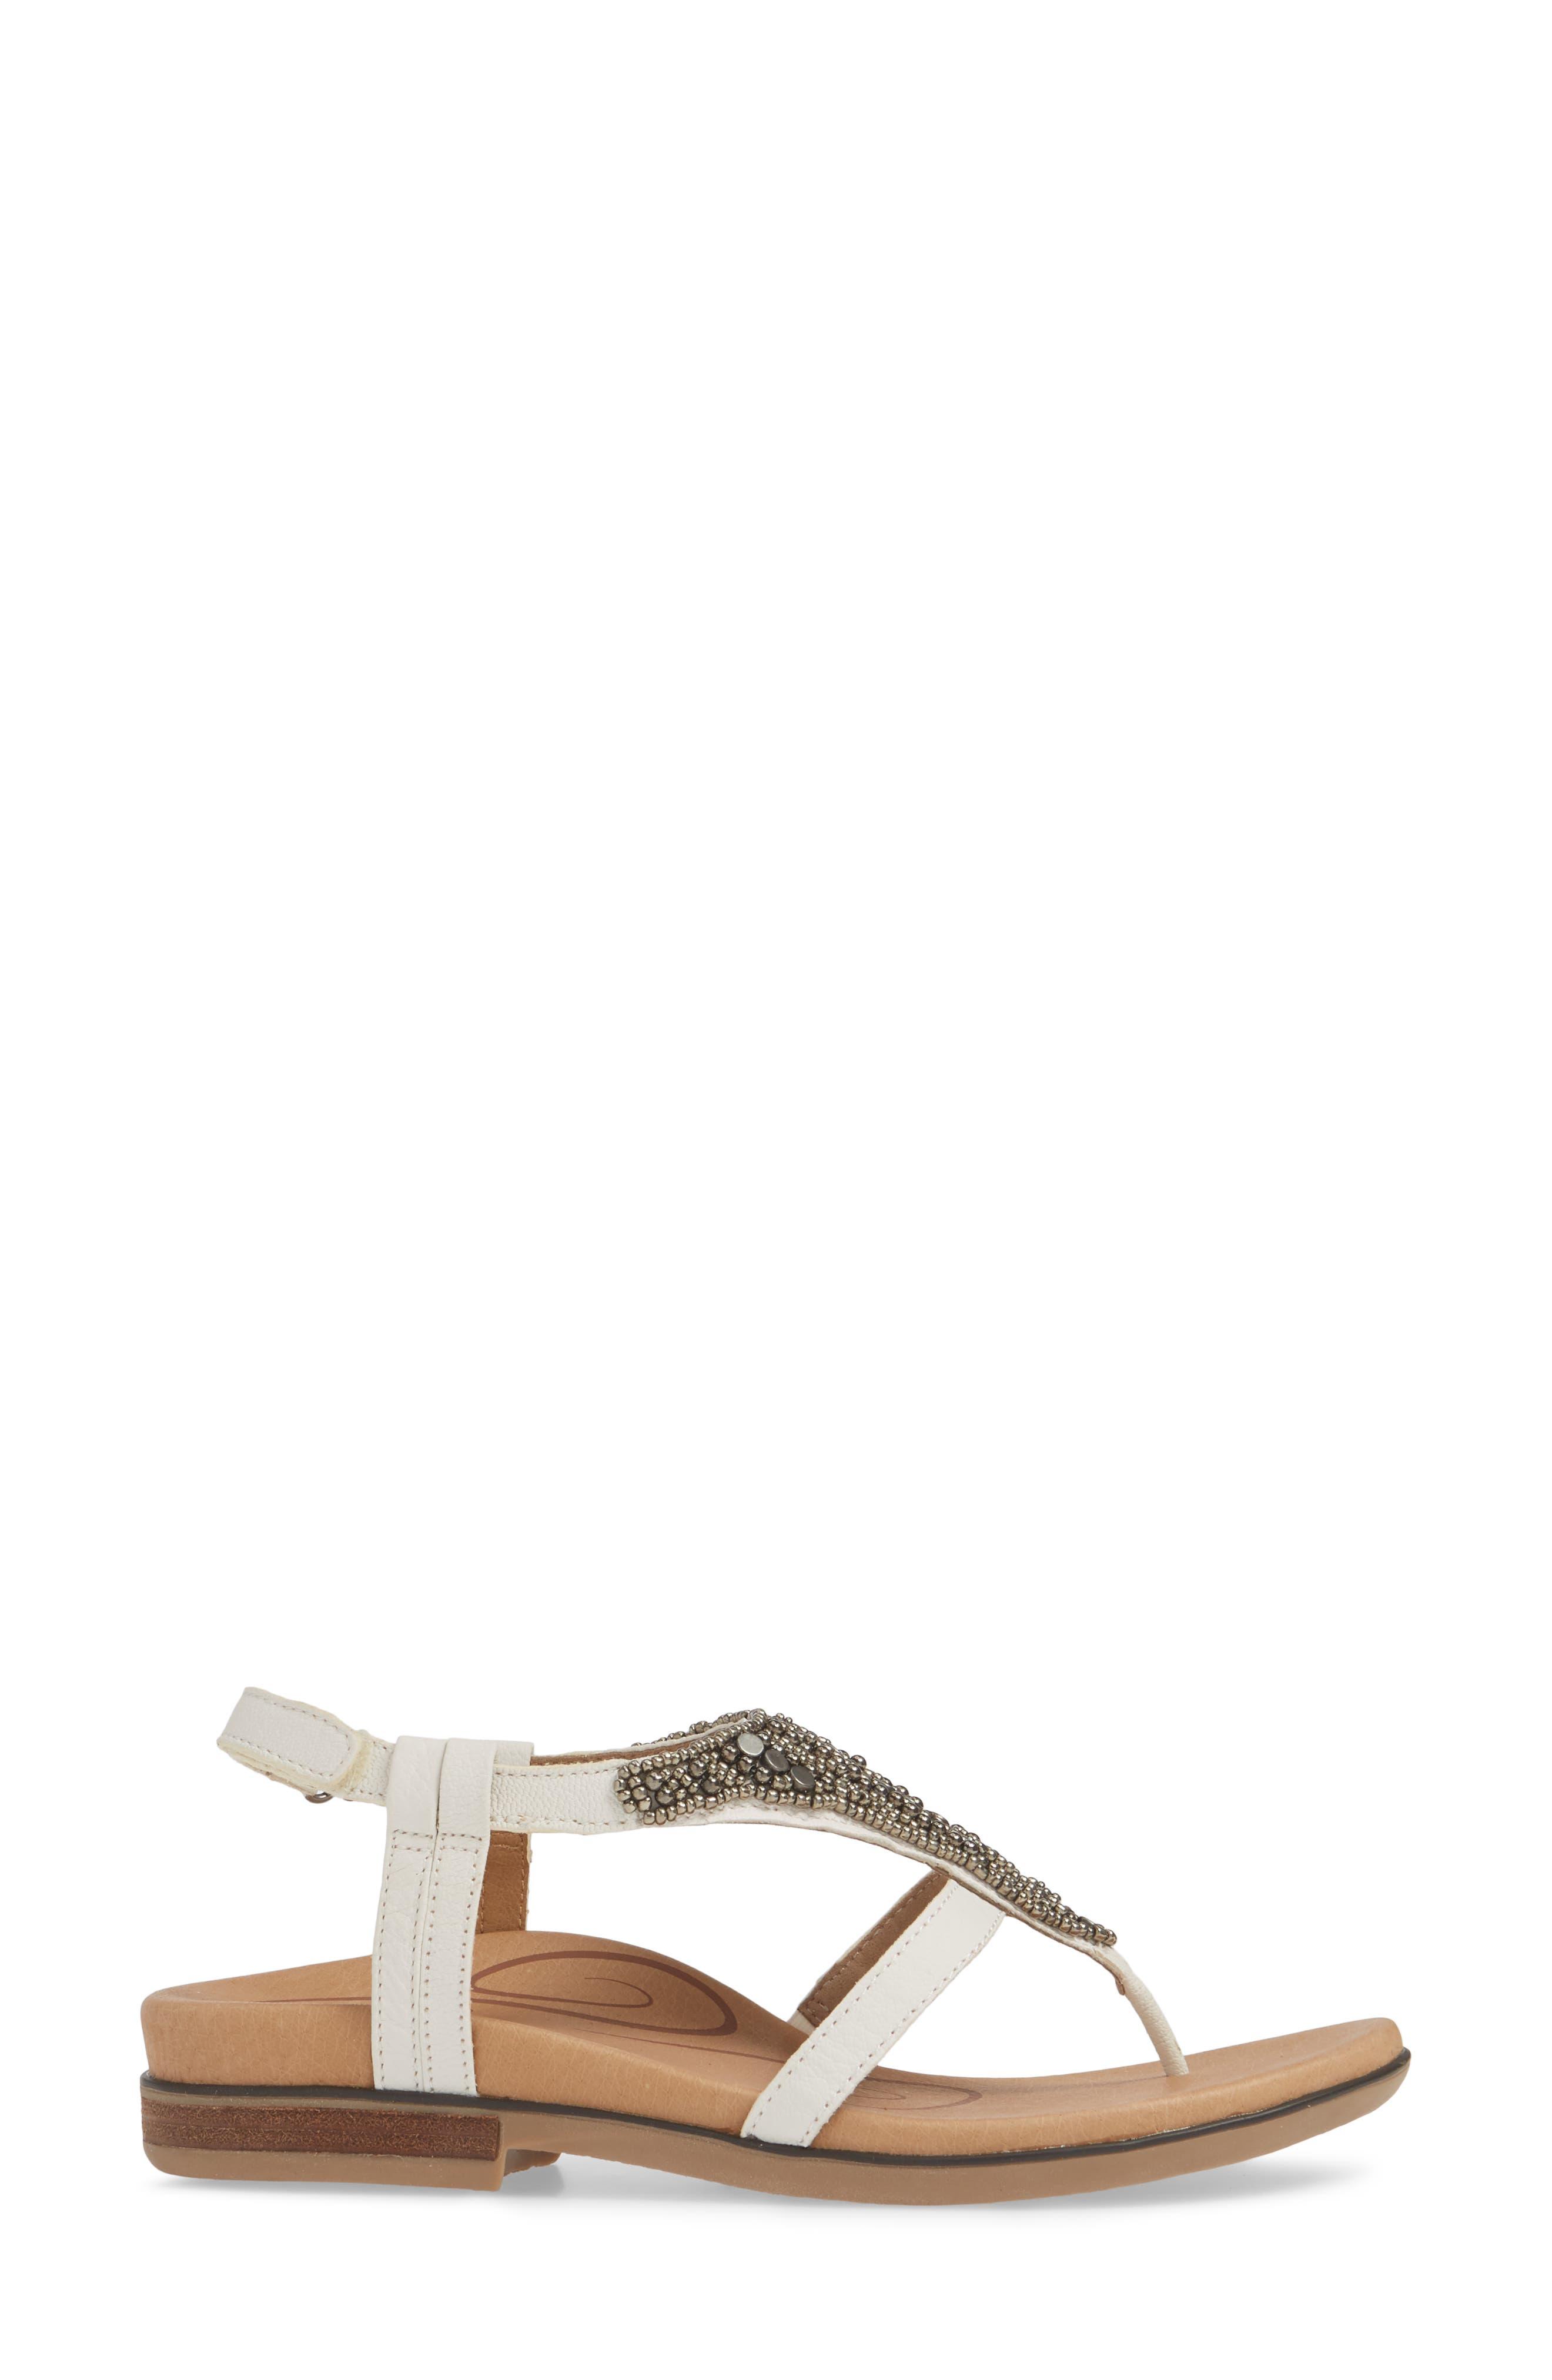 AETREX, Sheila Embellished Sandal, Alternate thumbnail 3, color, WHITE LEATHER